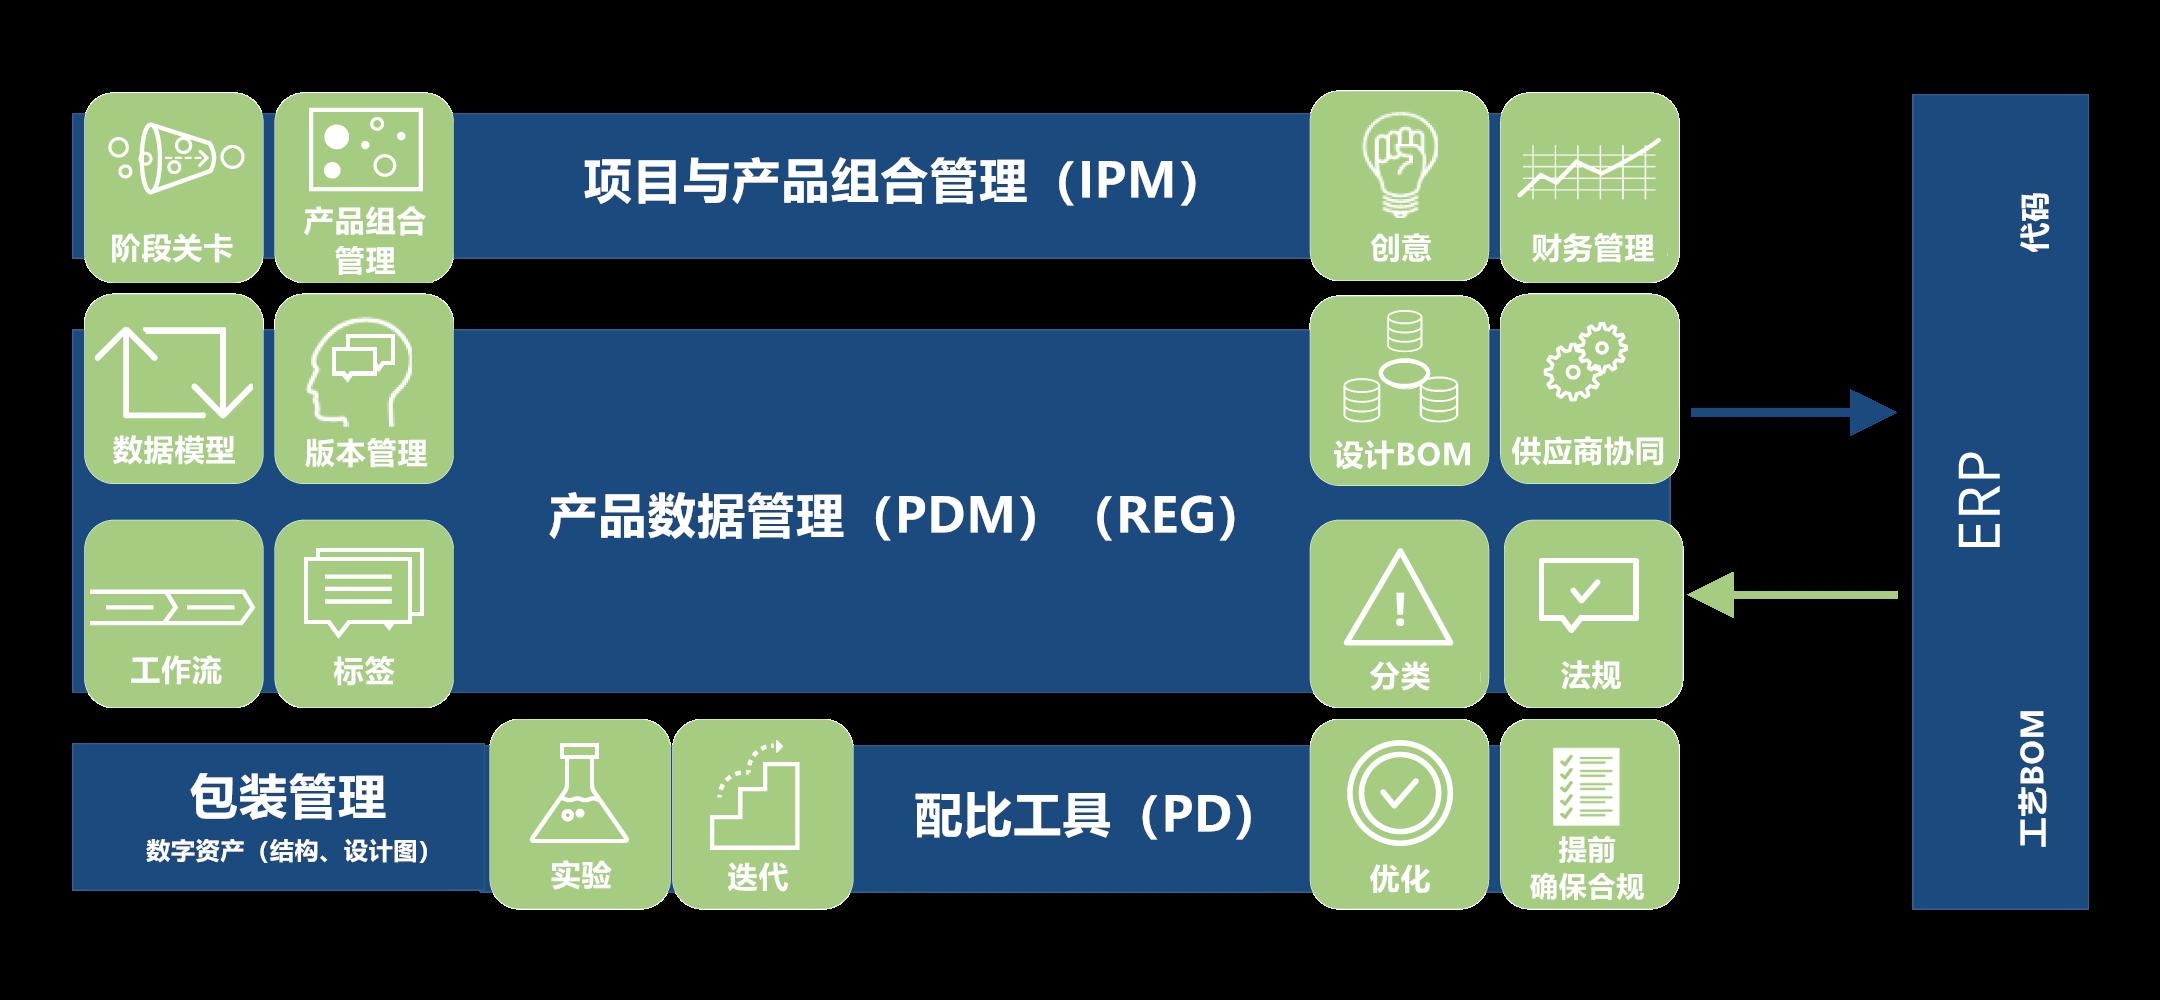 Devex PLM Architecture